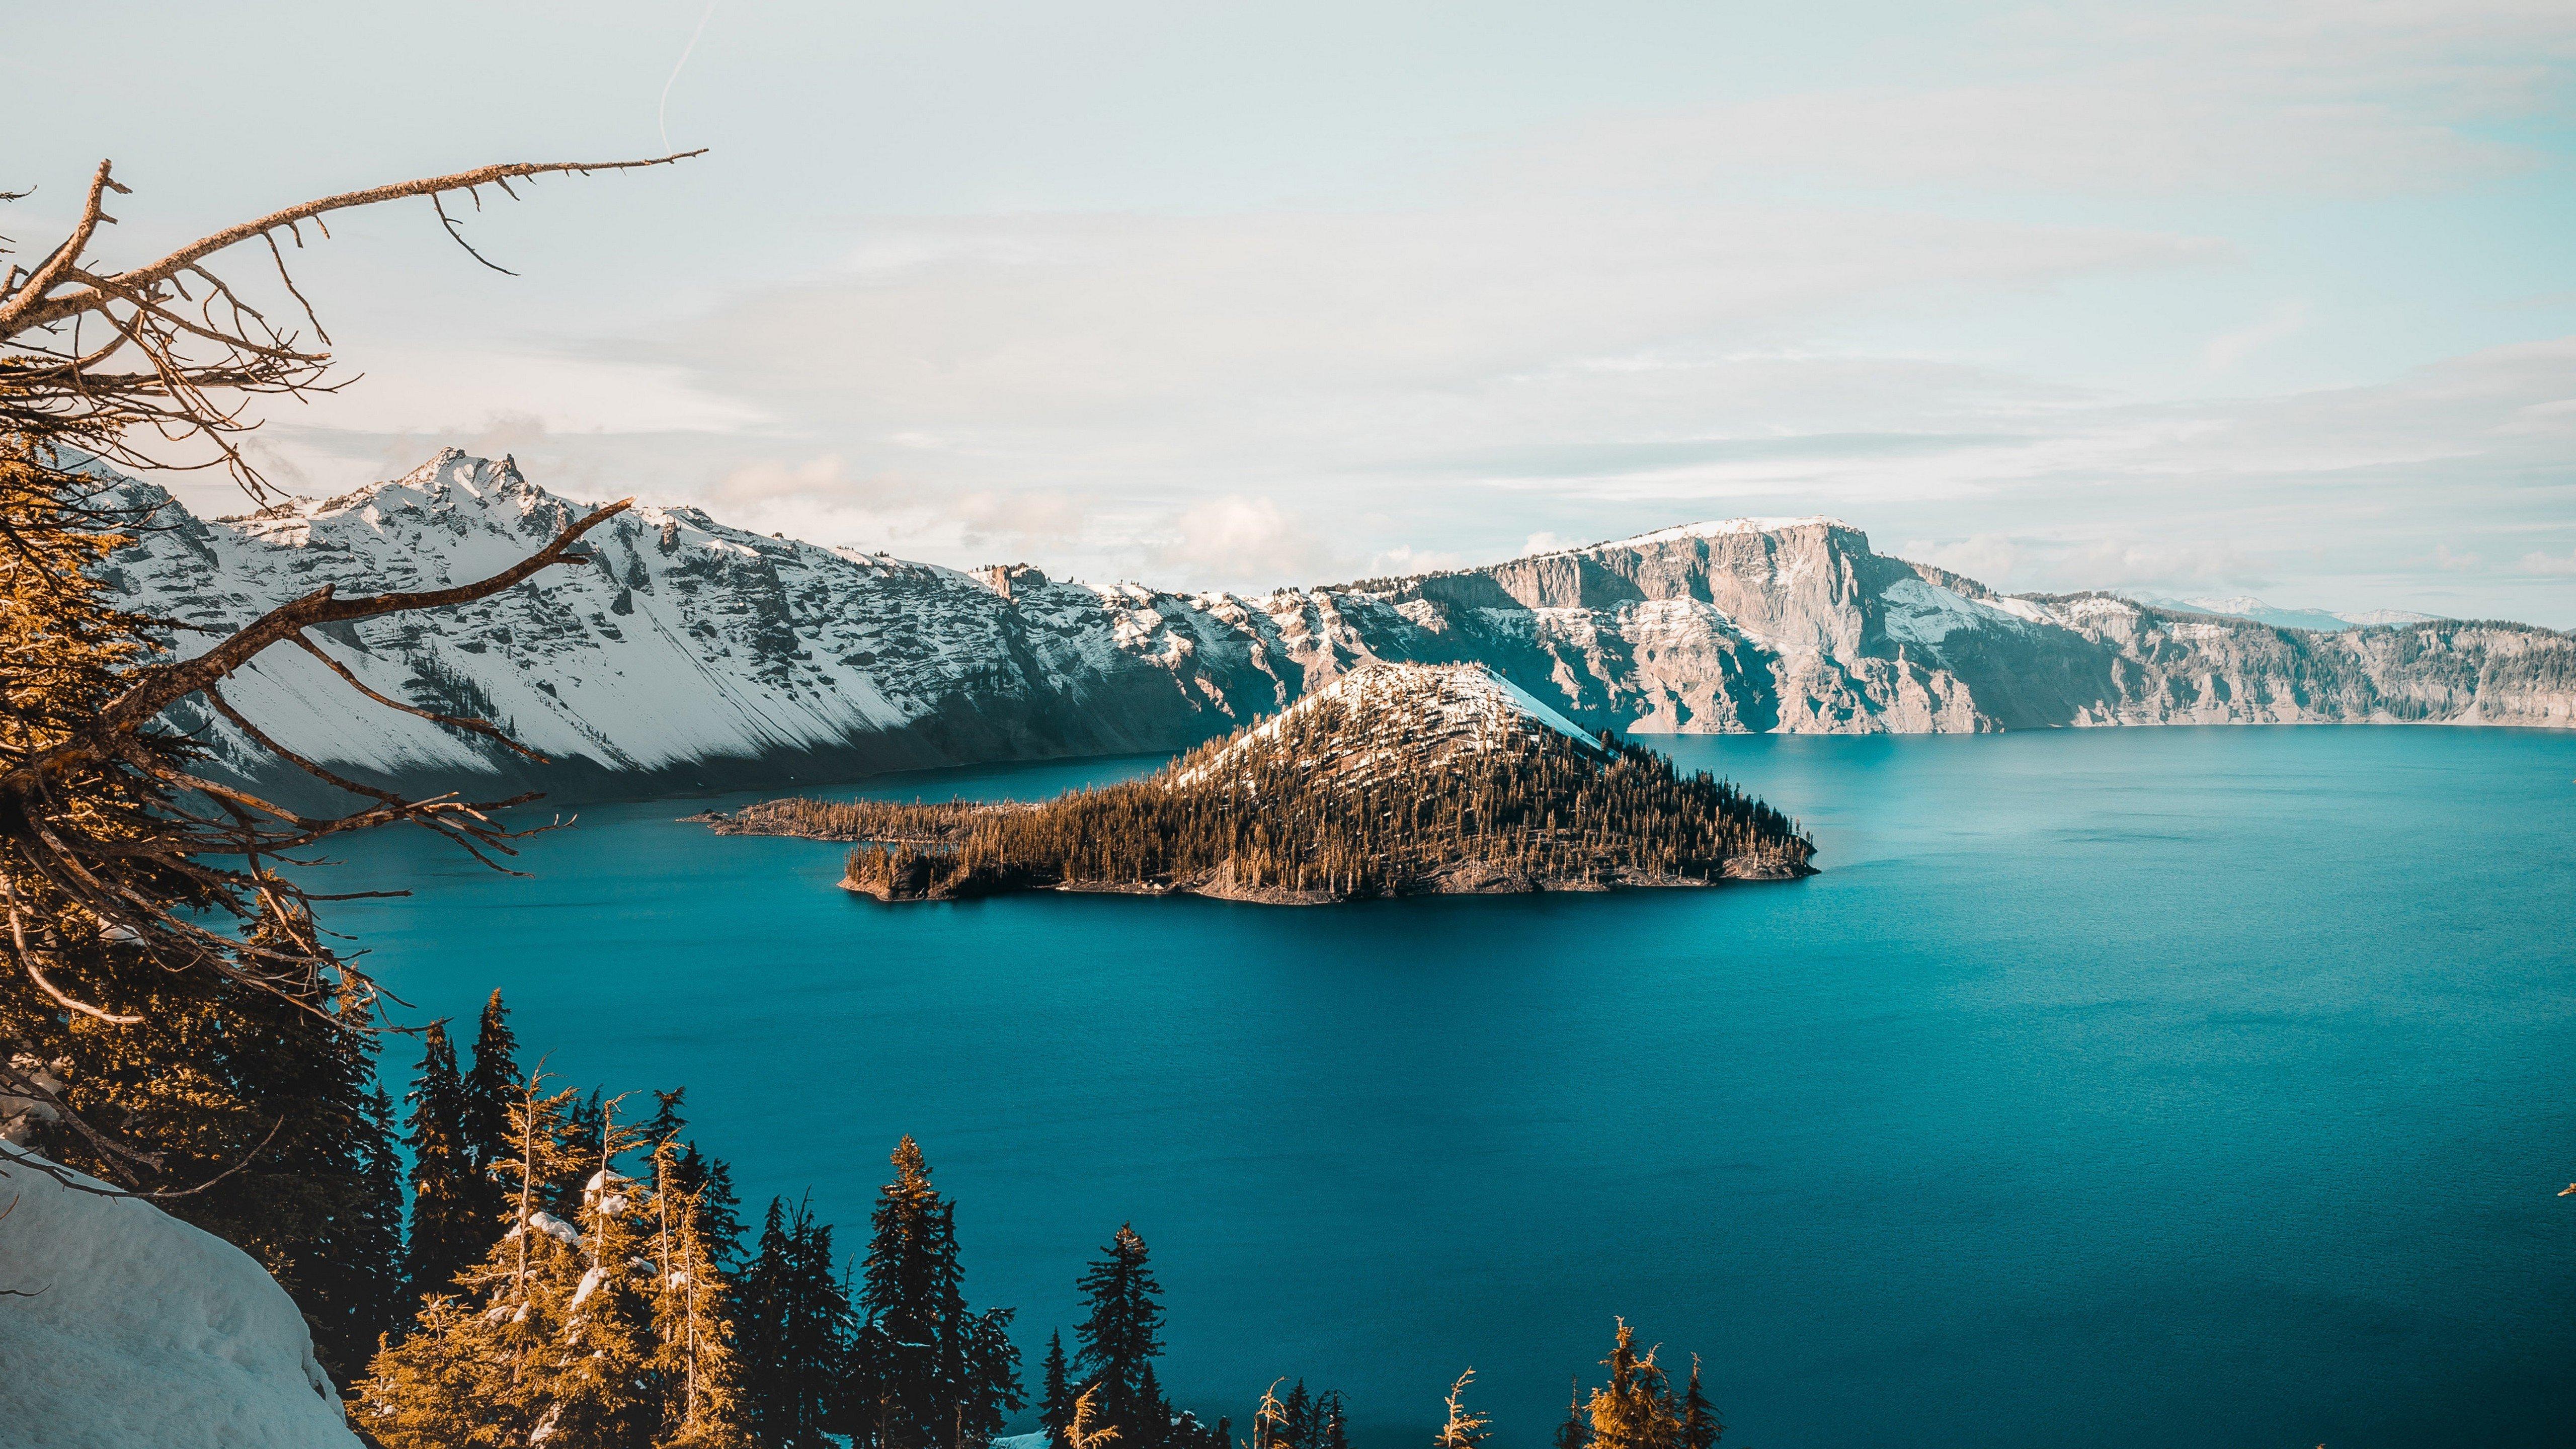 Wallpaper Lake in snowy mountains